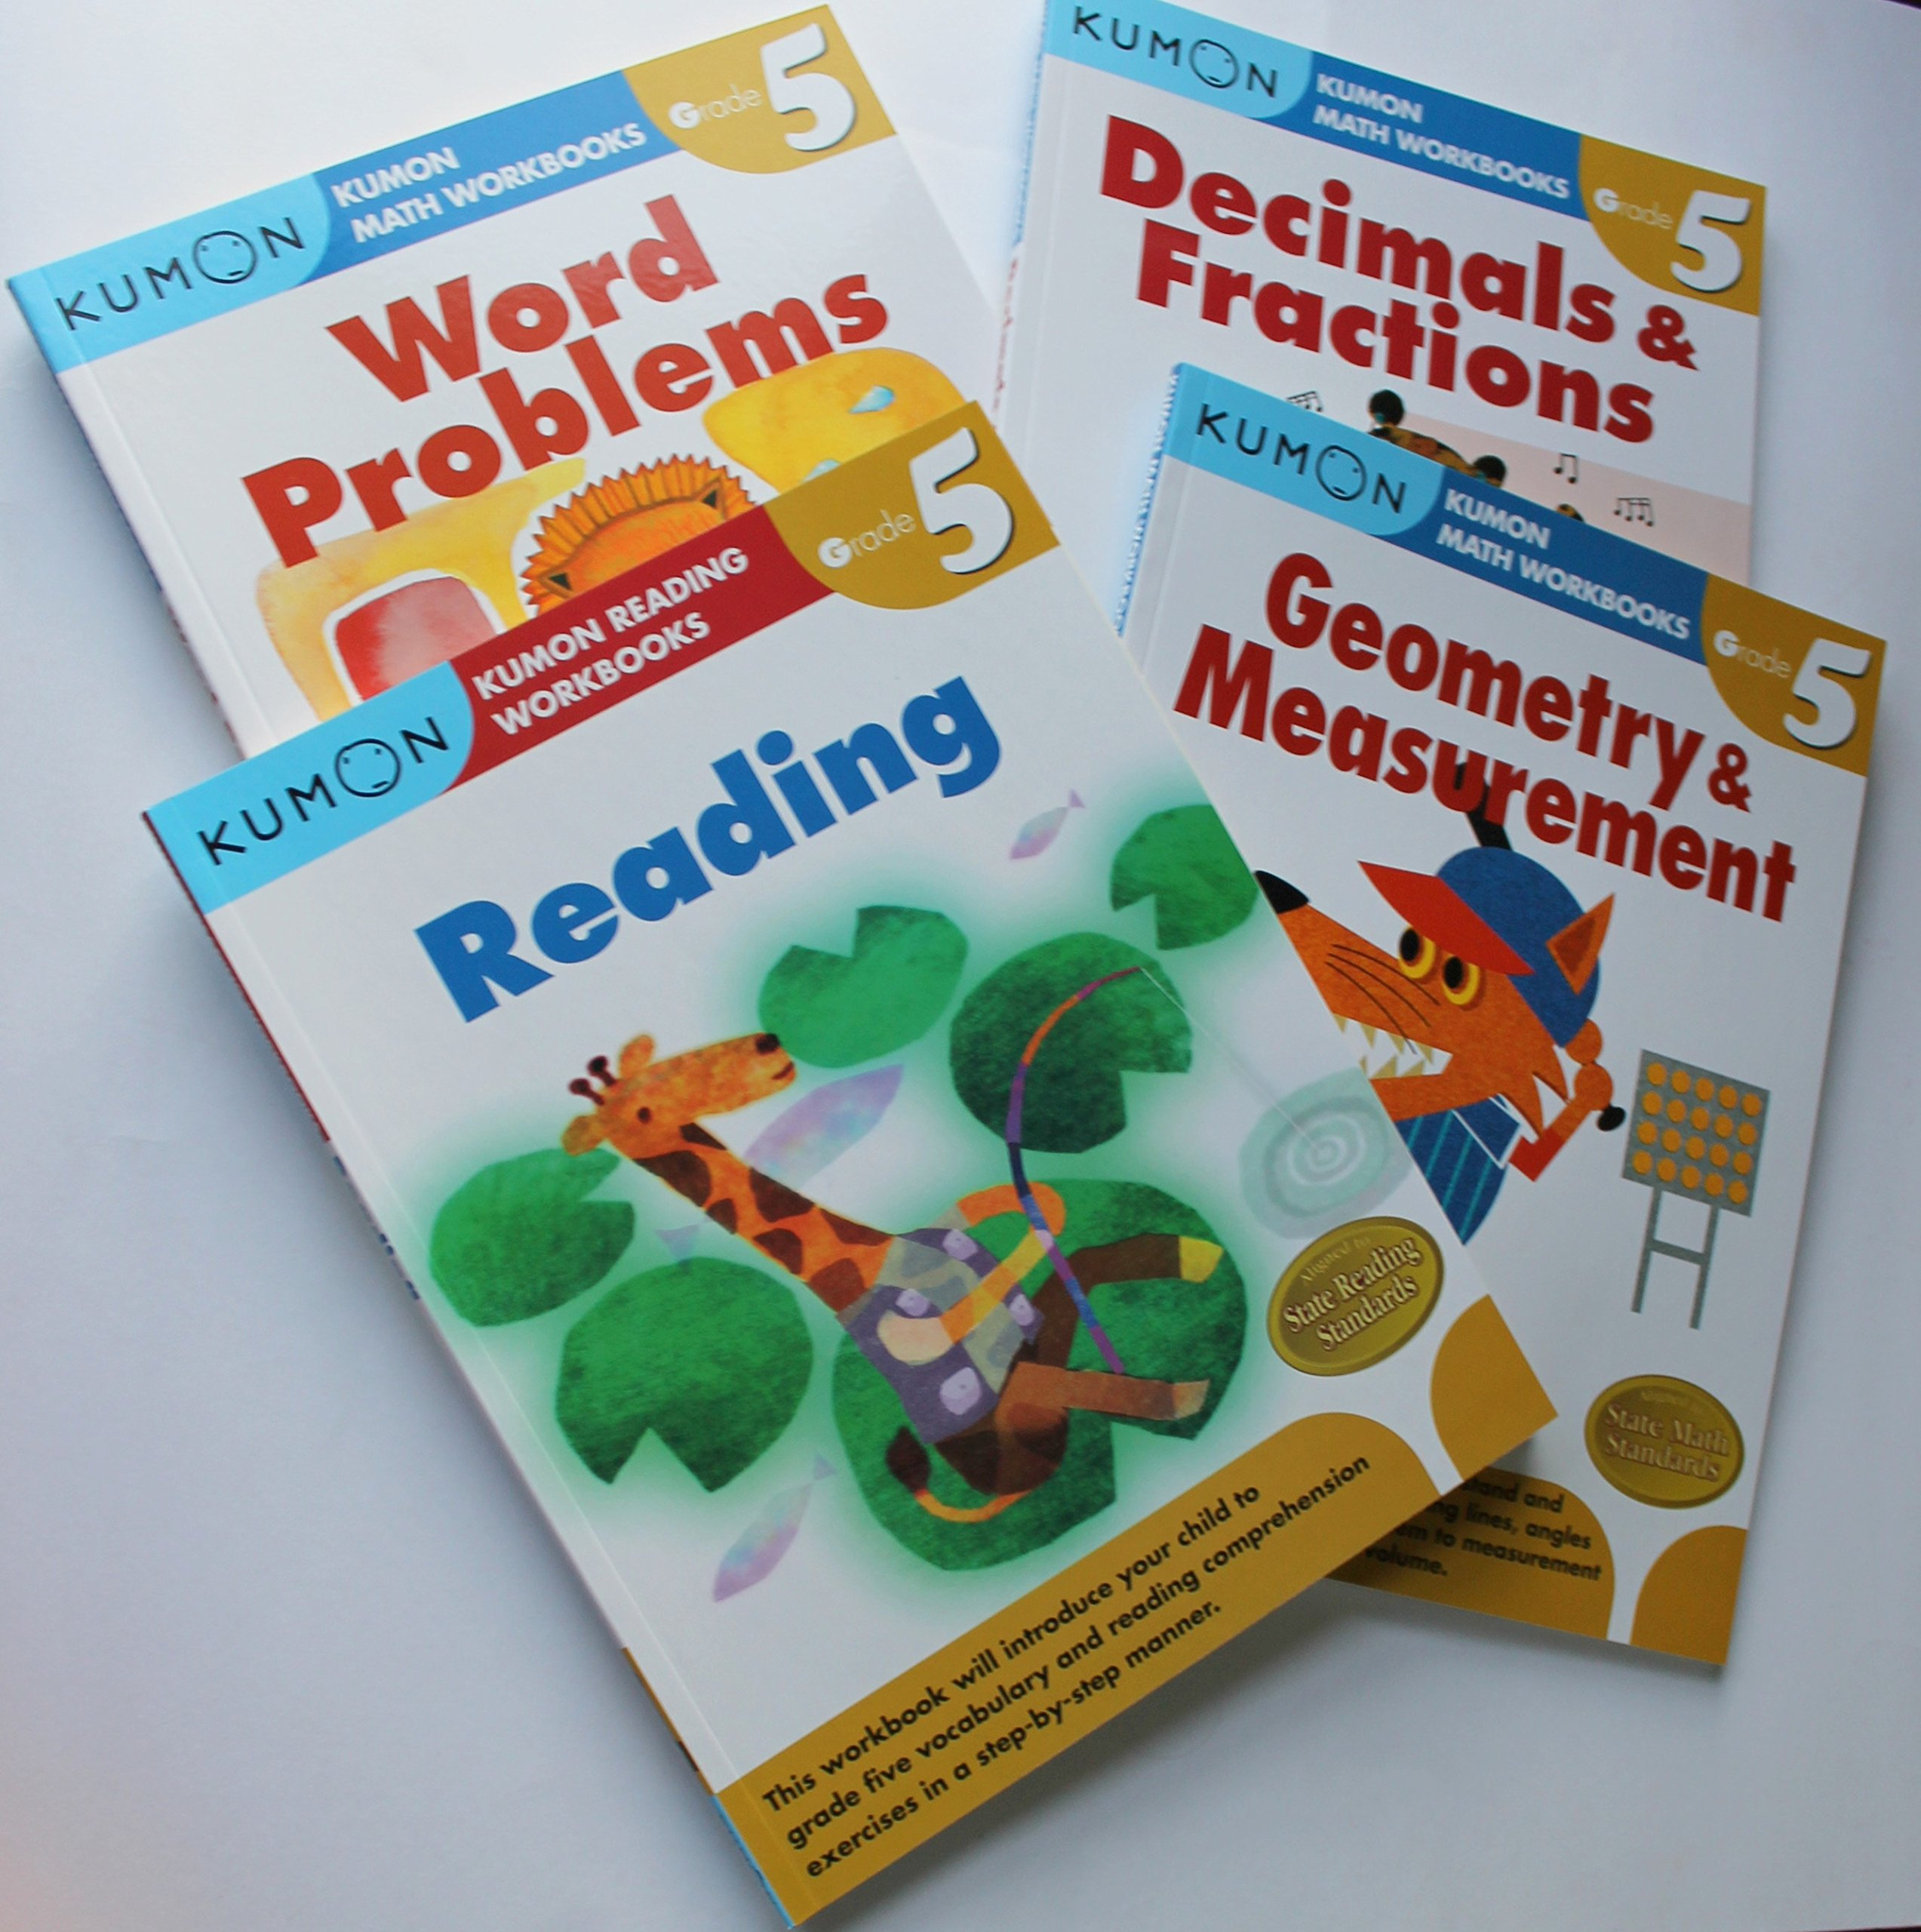 Kumon Grade 5 Math Verbal Workbooks 4 Books Reading Decimals Fractions Geometry Measurement And Word Problem Kumon Books Amazon Ca [ 2560 x 2546 Pixel ]